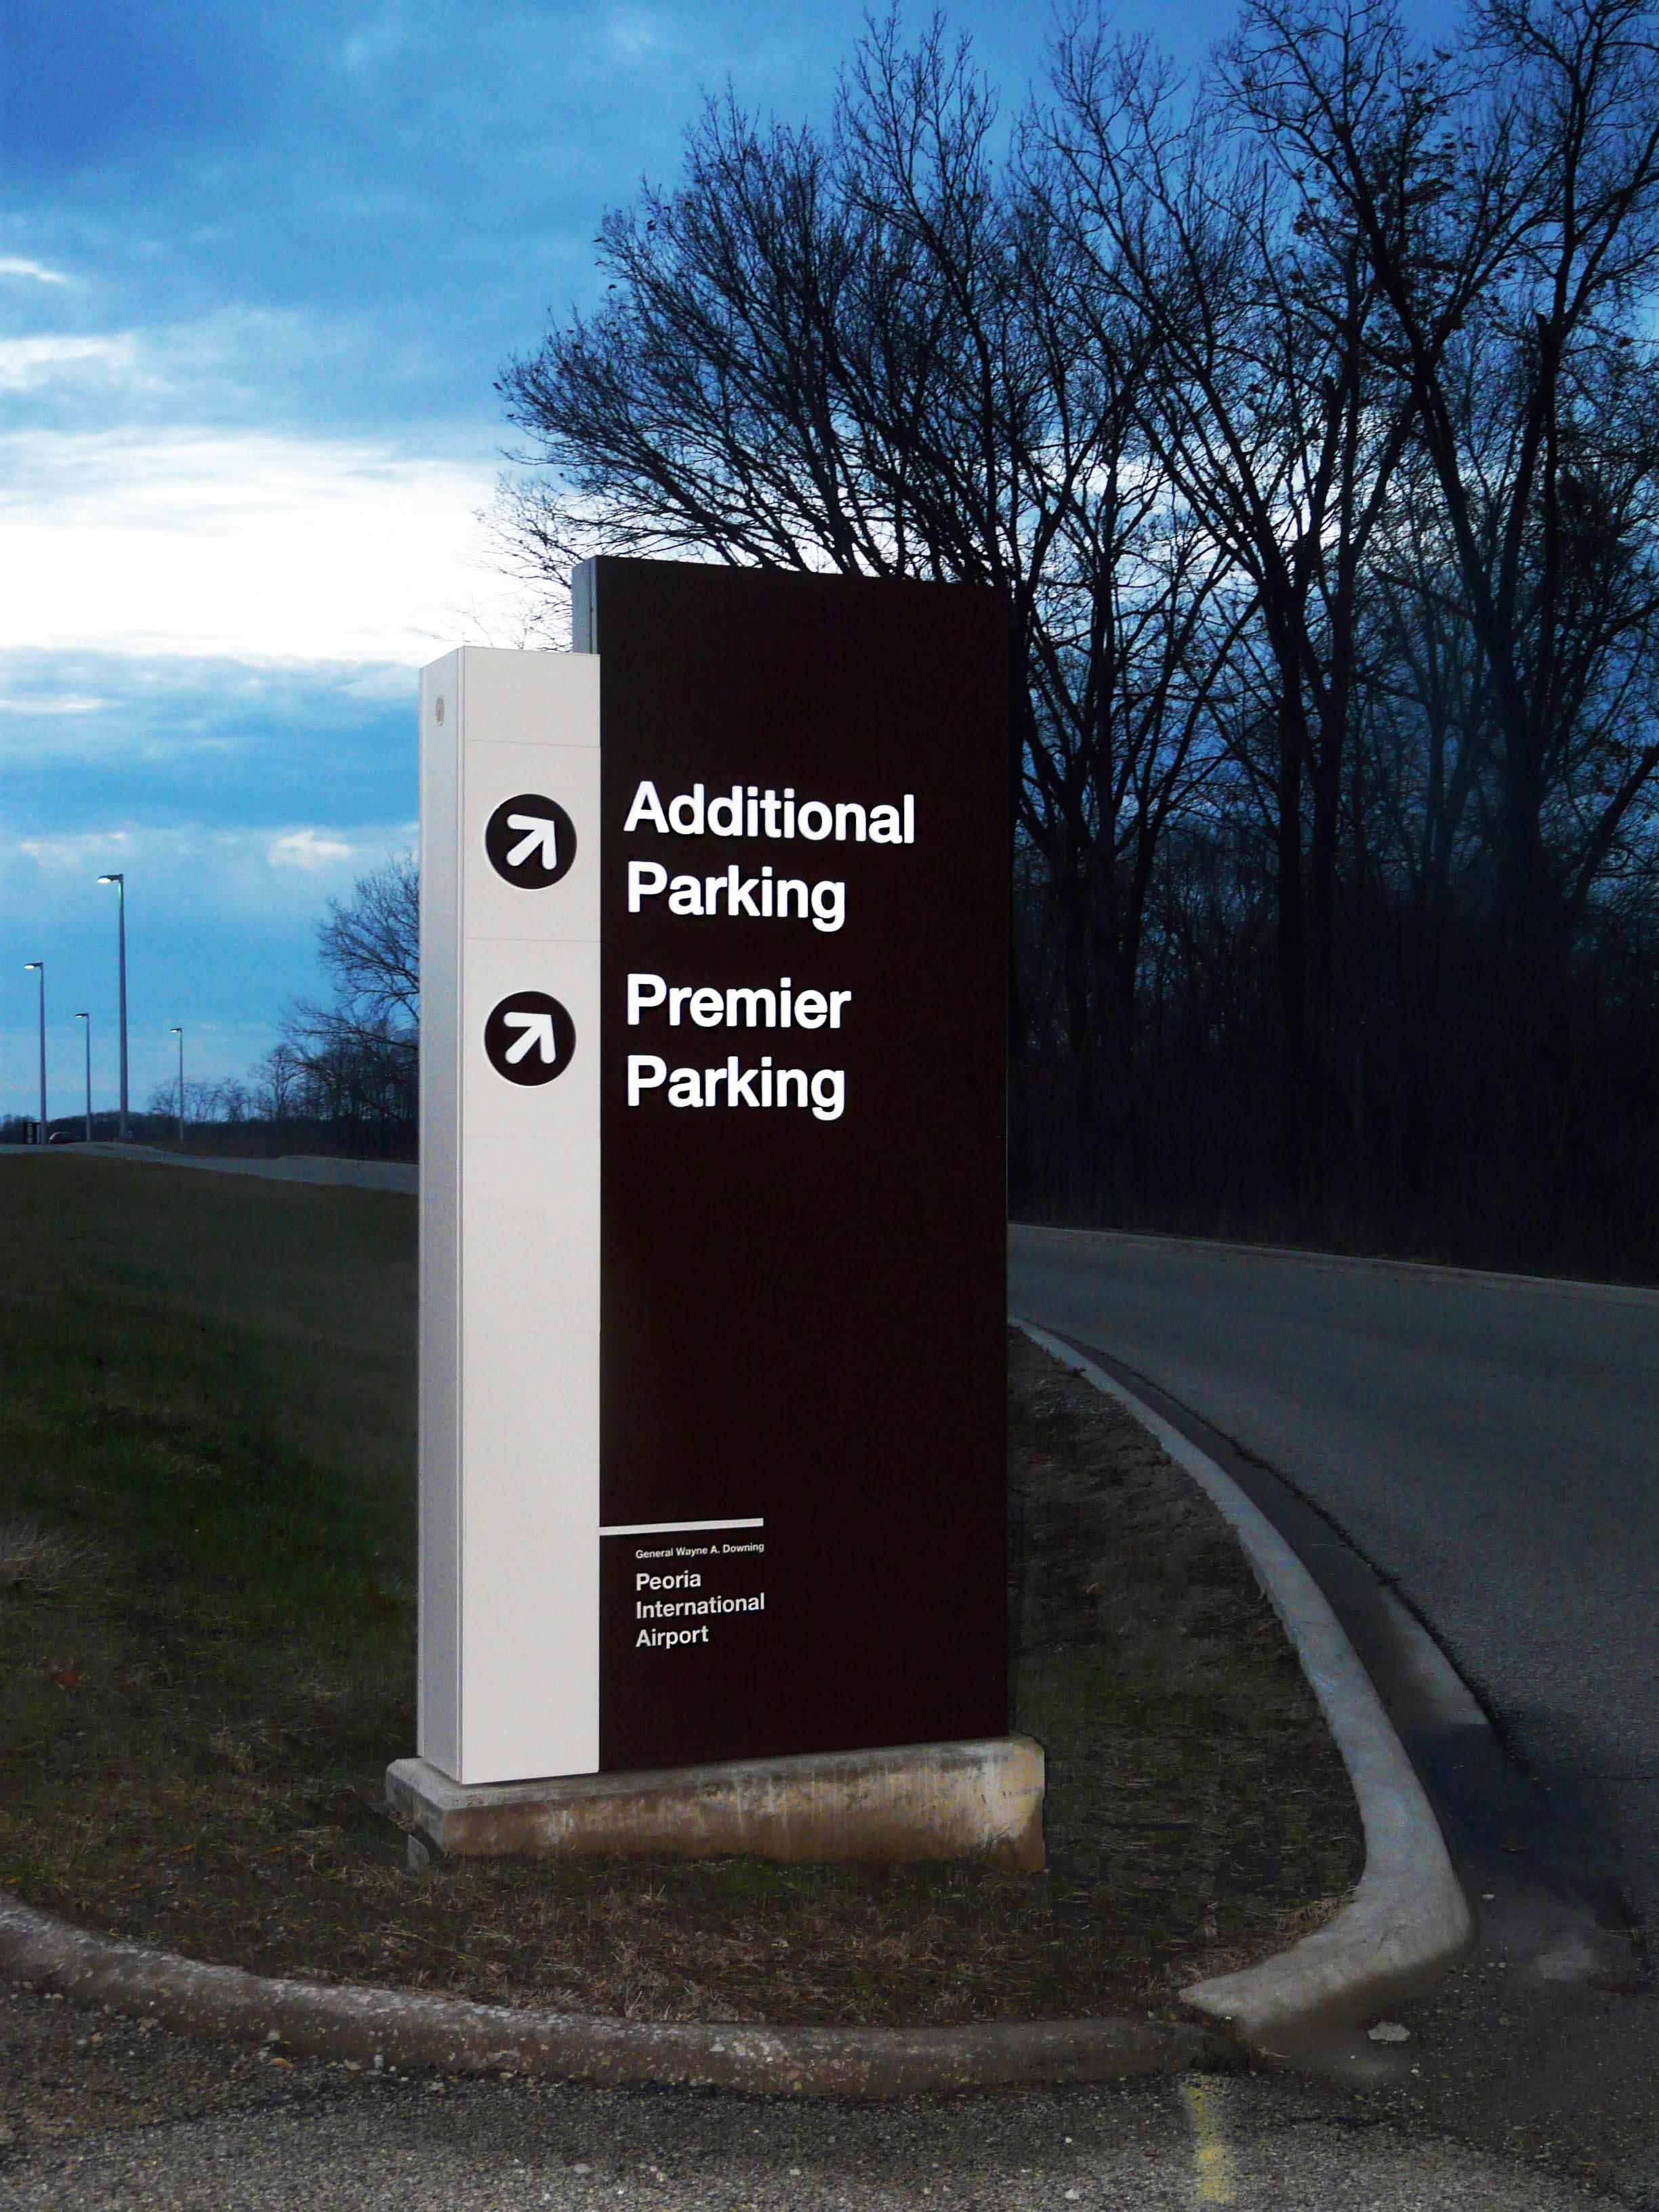 Parking Signage At Peoria